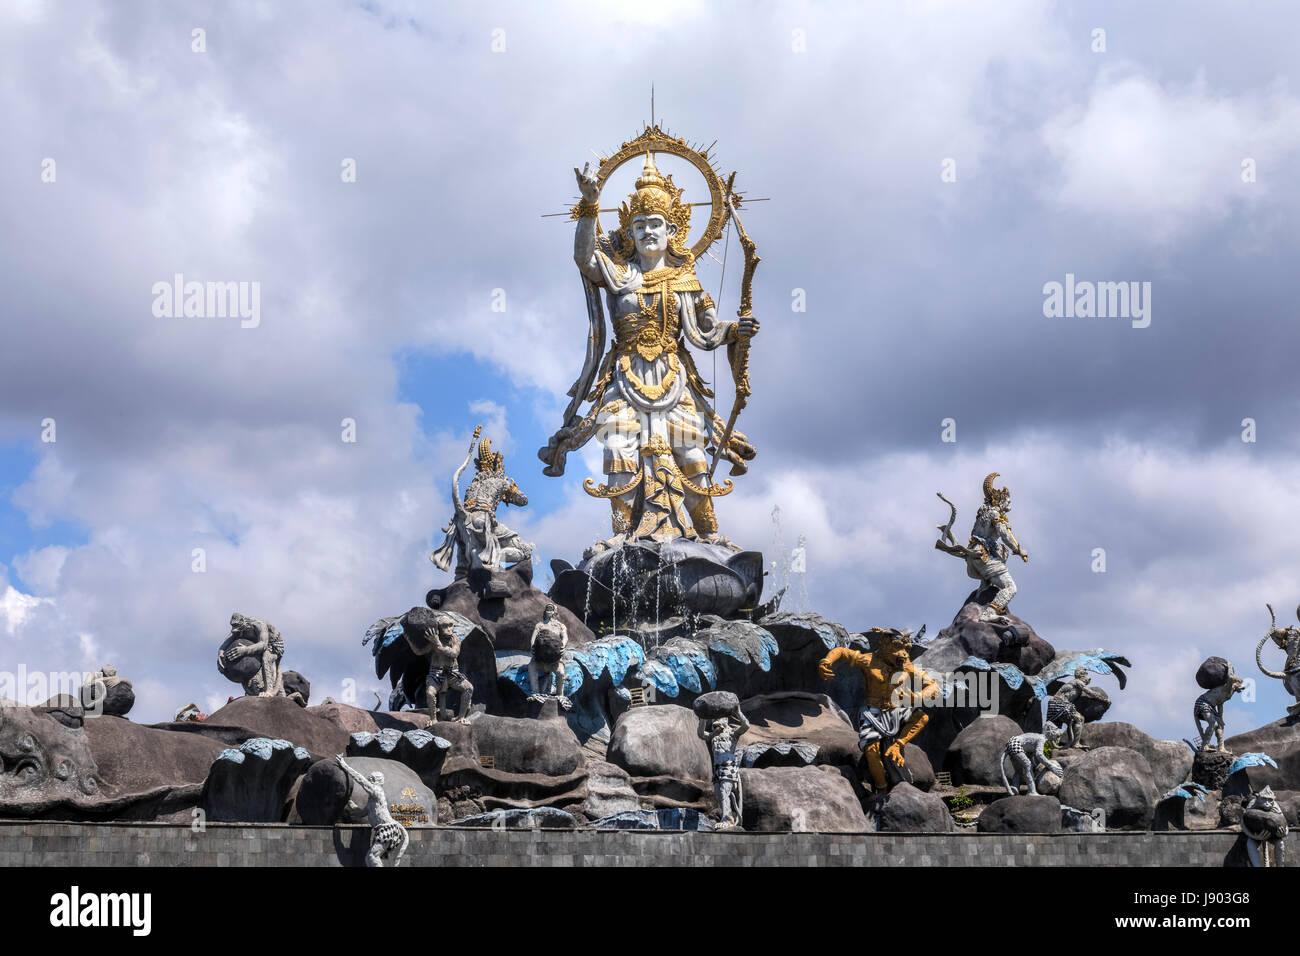 Titi Banda monumento, Denpasar, Bali, Indonesia, Asia Immagini Stock